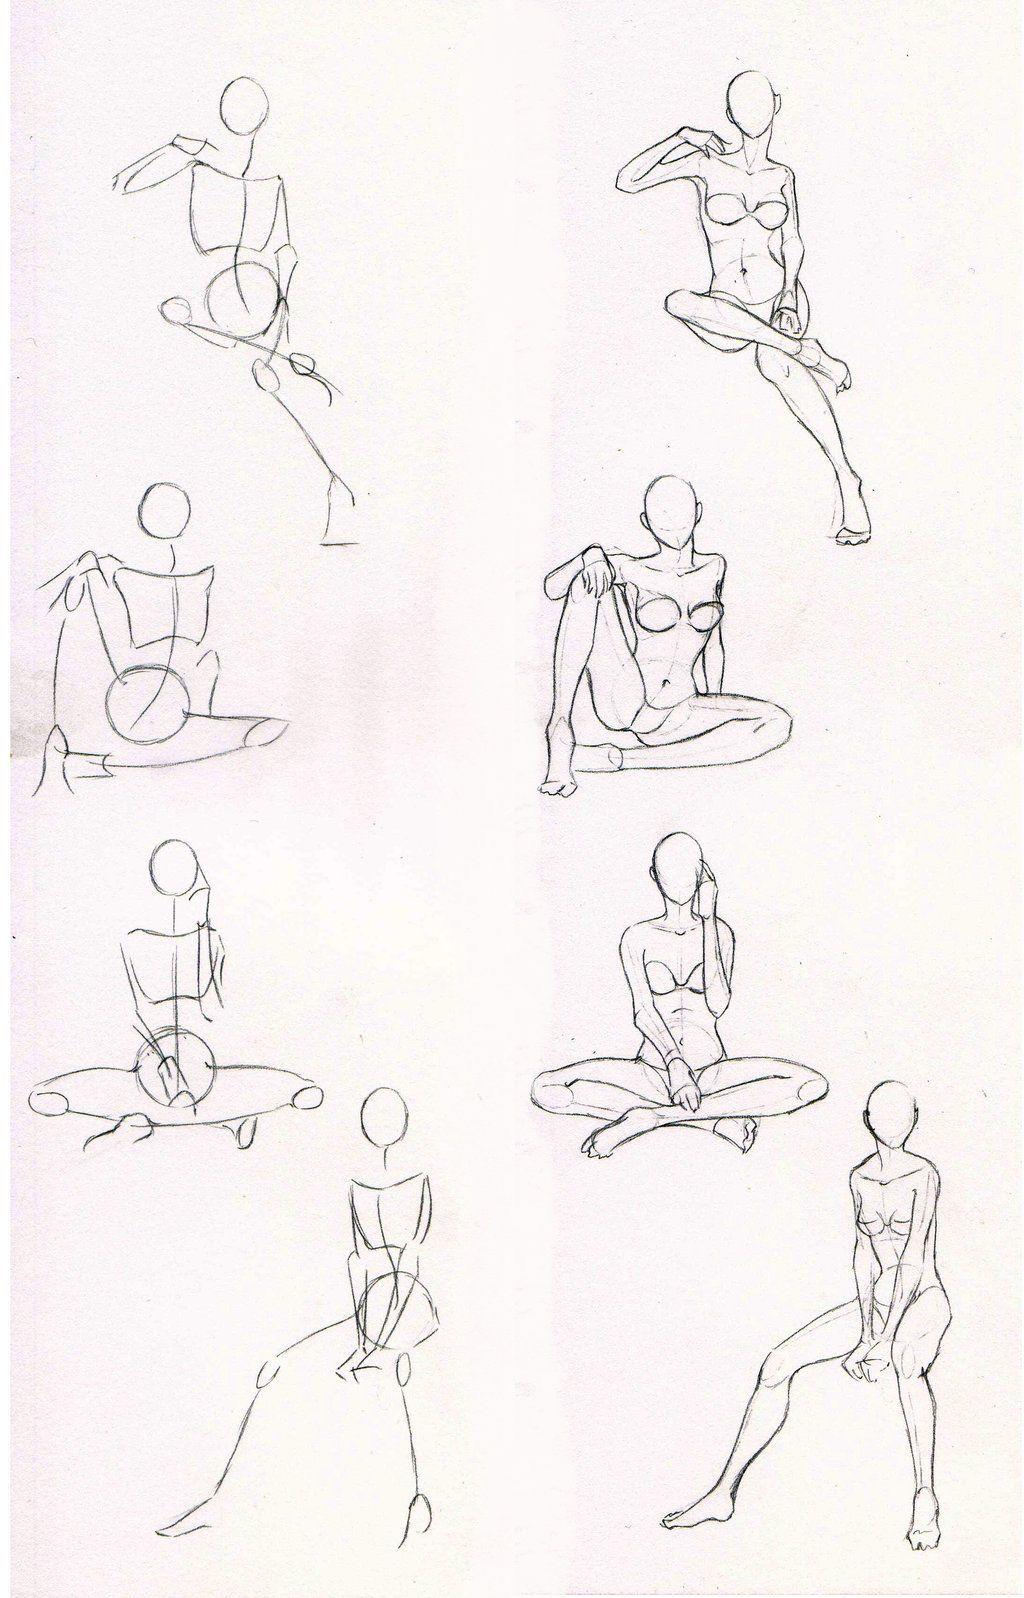 Pin by Otaku V on art | Pinterest | Drawings, Pose and Anatomy